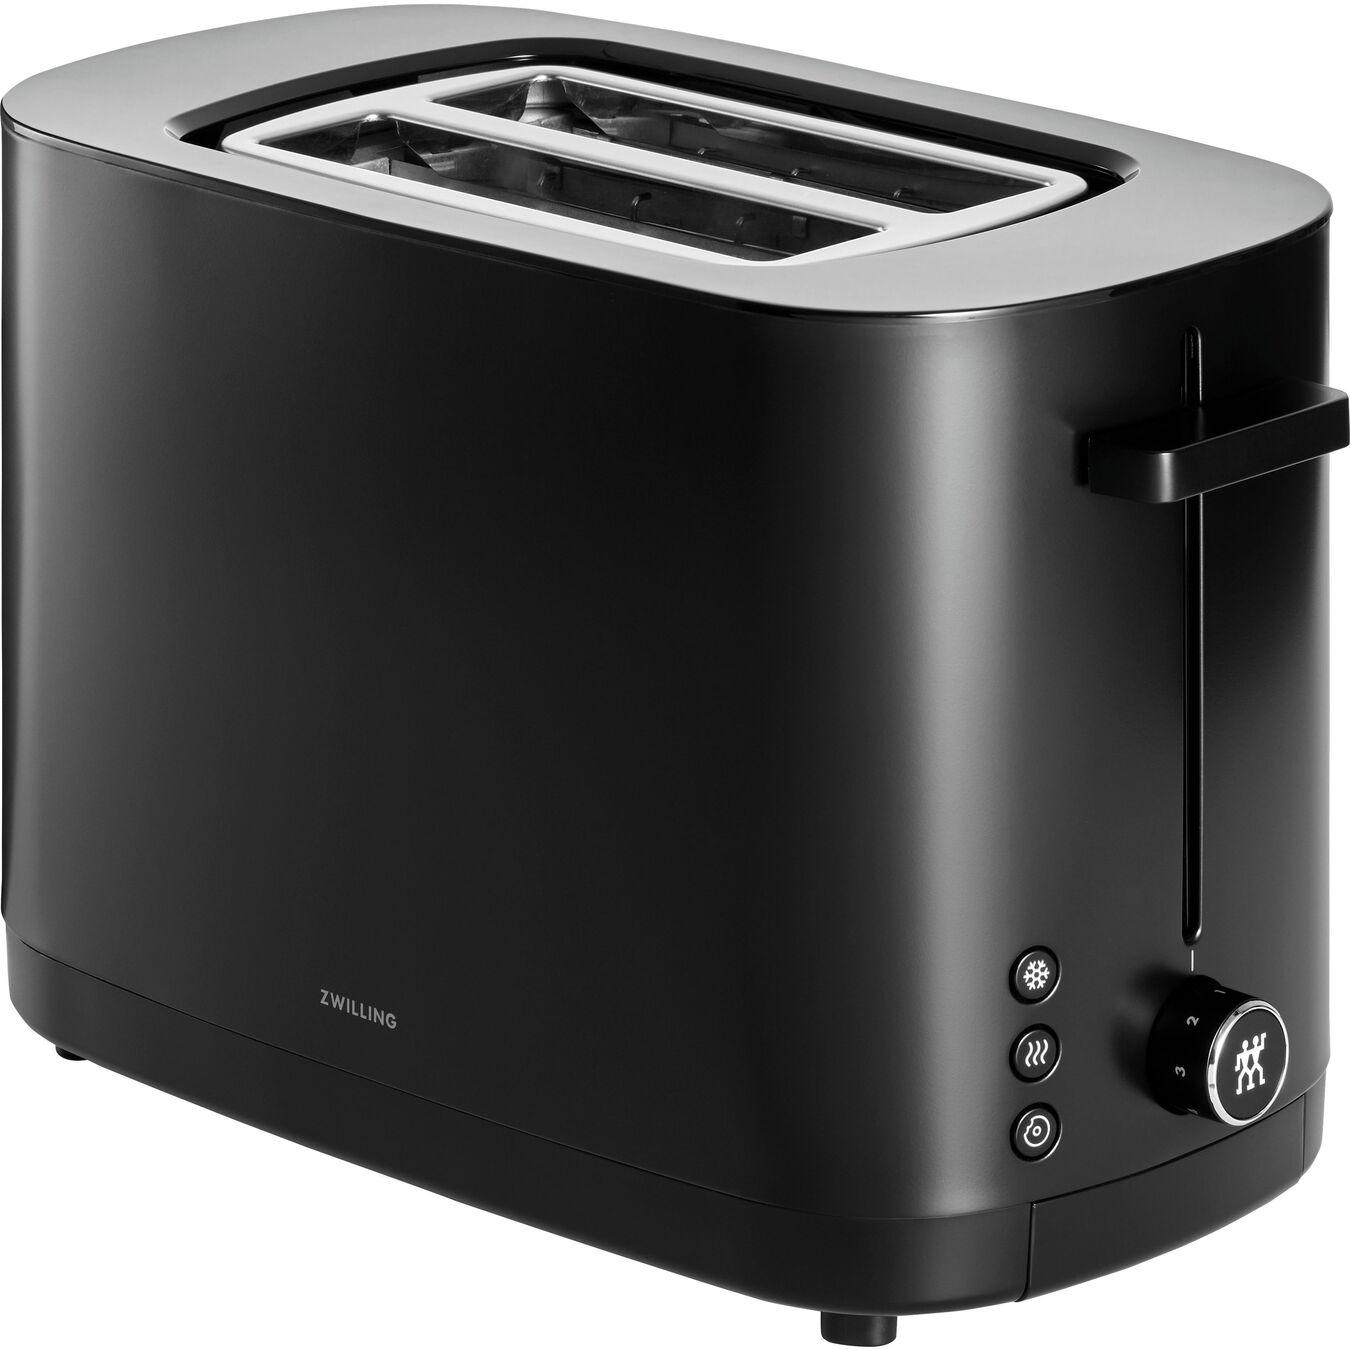 2 Slot Toaster - Black,,large 1